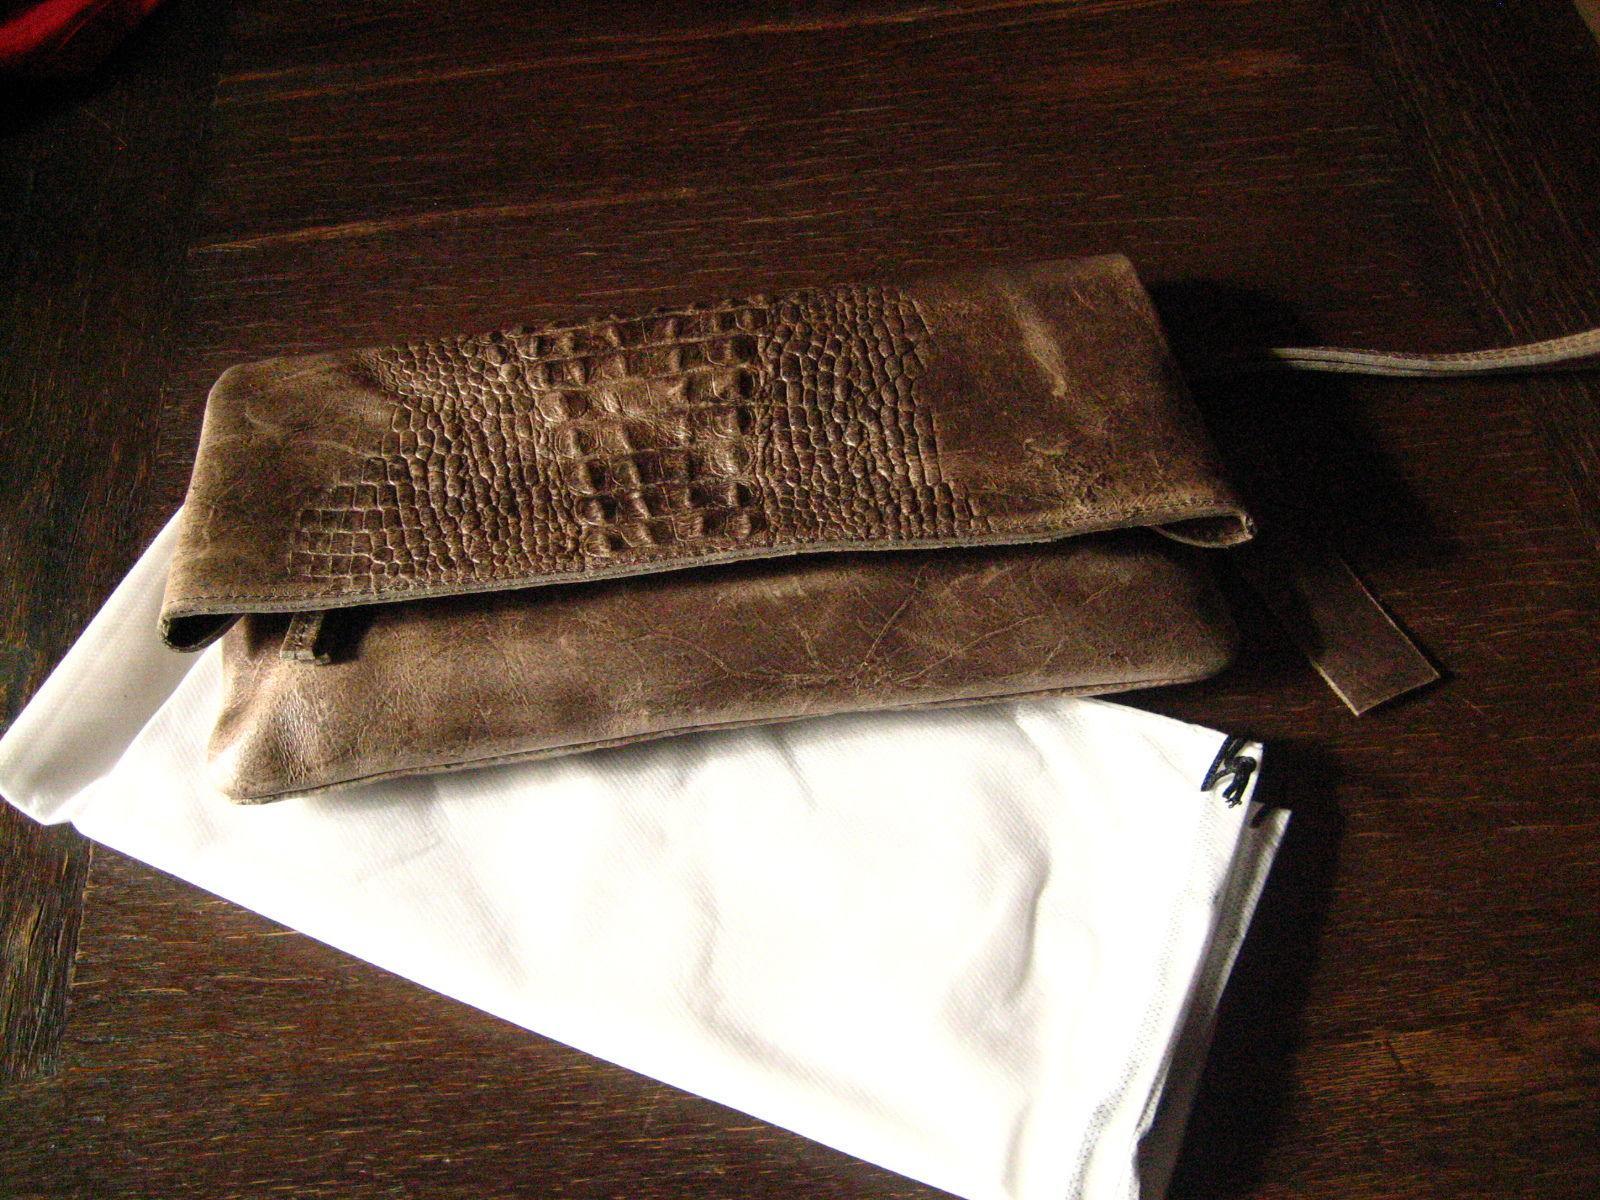 45e9f42bcd2ea ... luxuriöse echt Leder Tasche Clutch Kroko Prägung schwarz Designer R.  Leonardi 4 ...